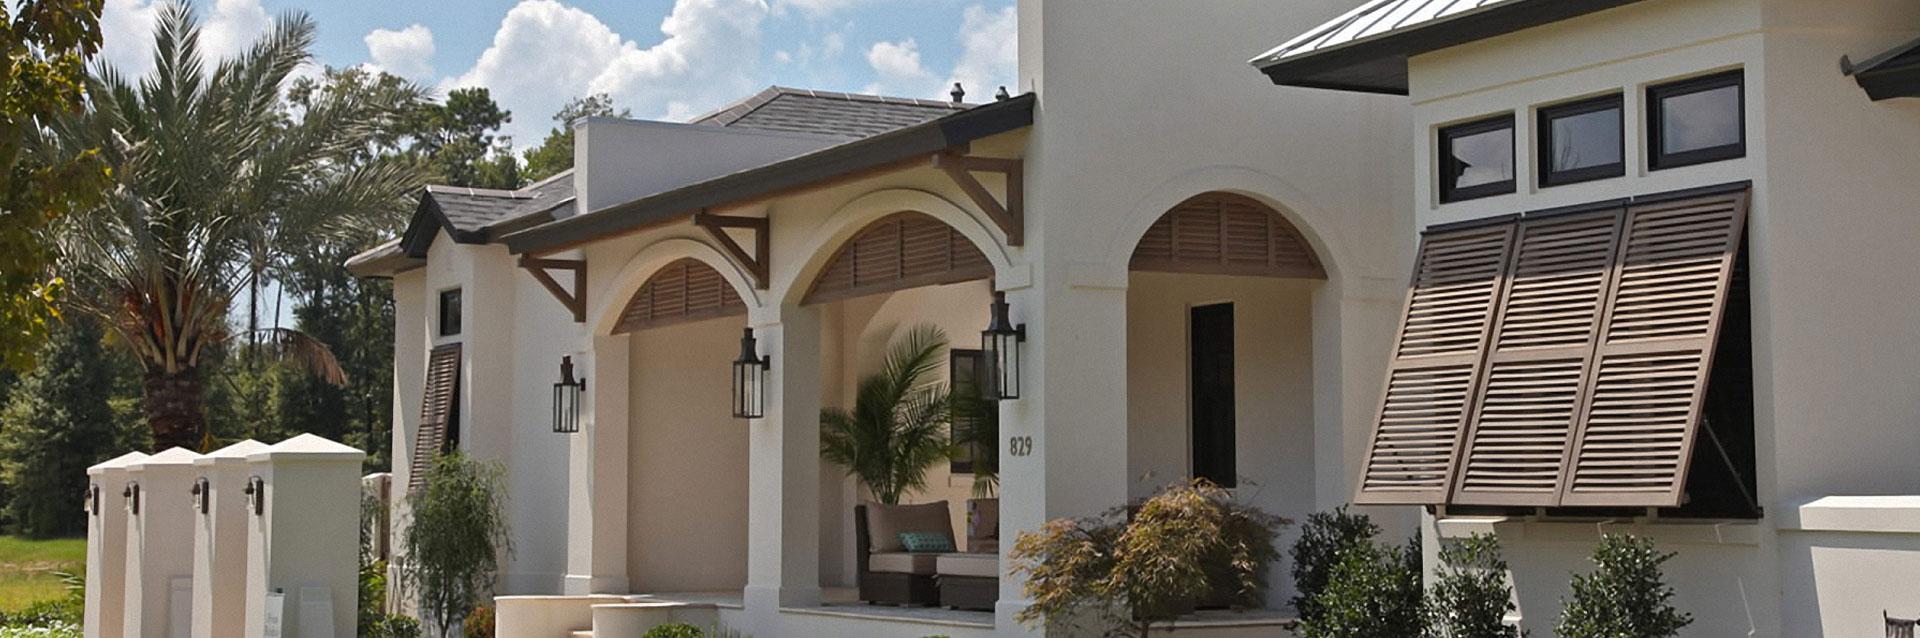 SO-Outdoor Bahama Shutters